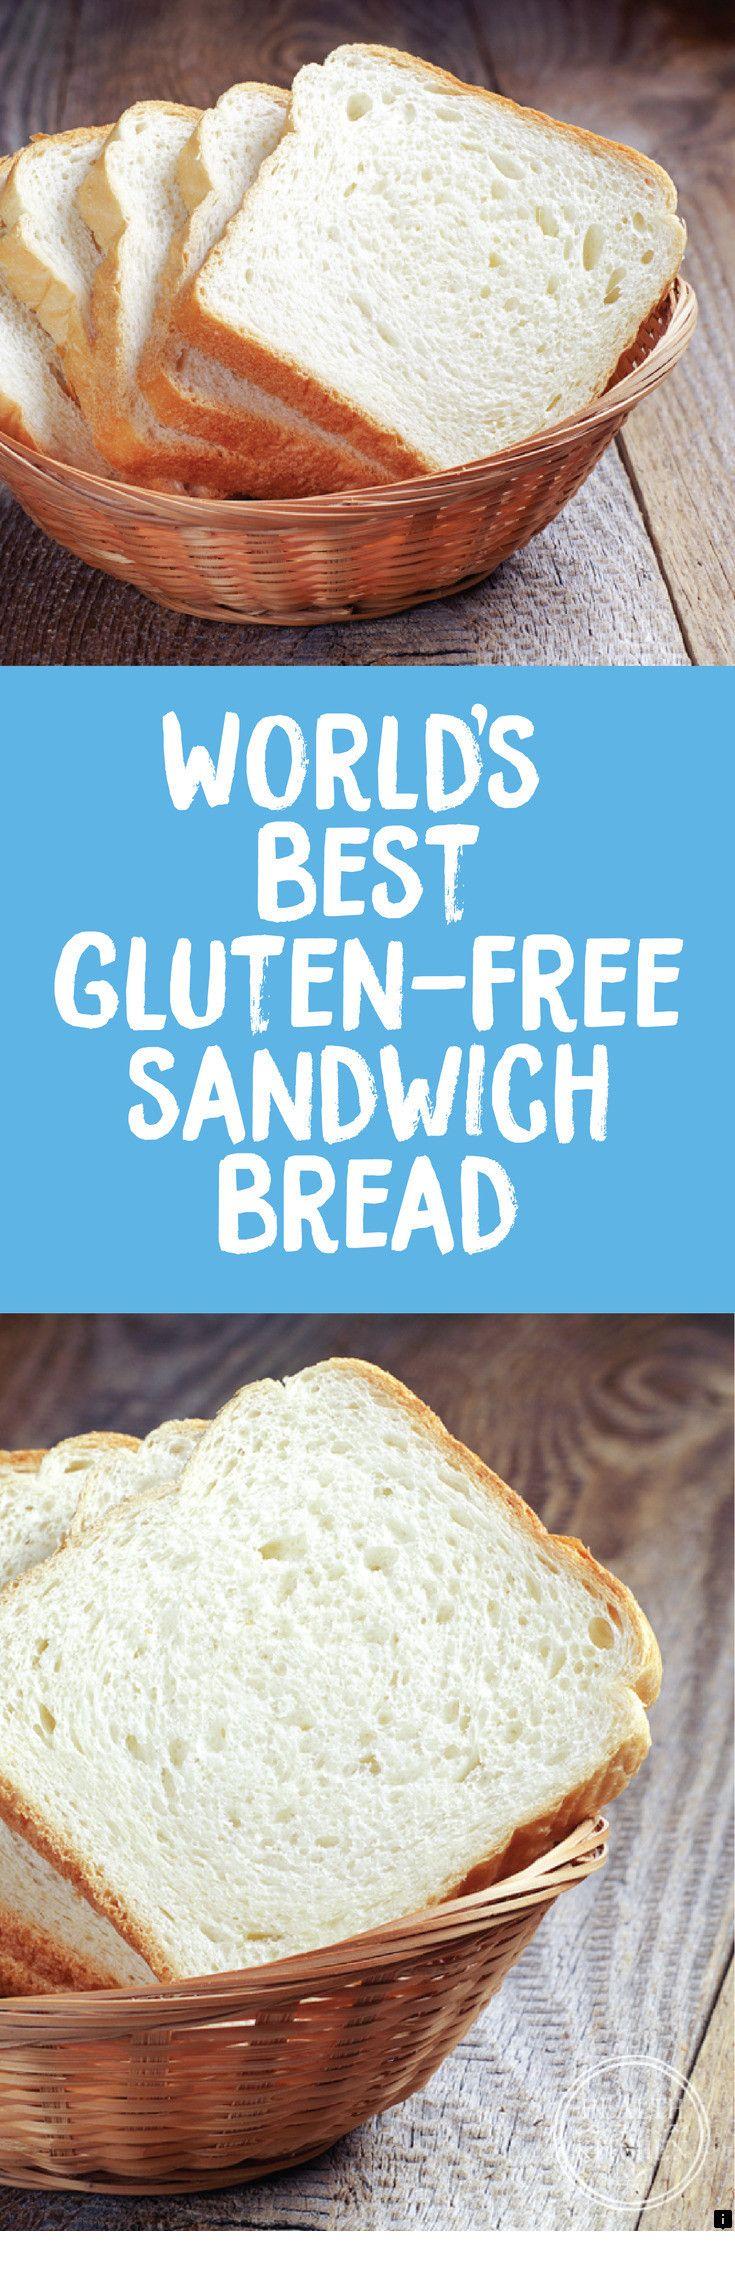 Read information on gluten free desserts near me. Simply